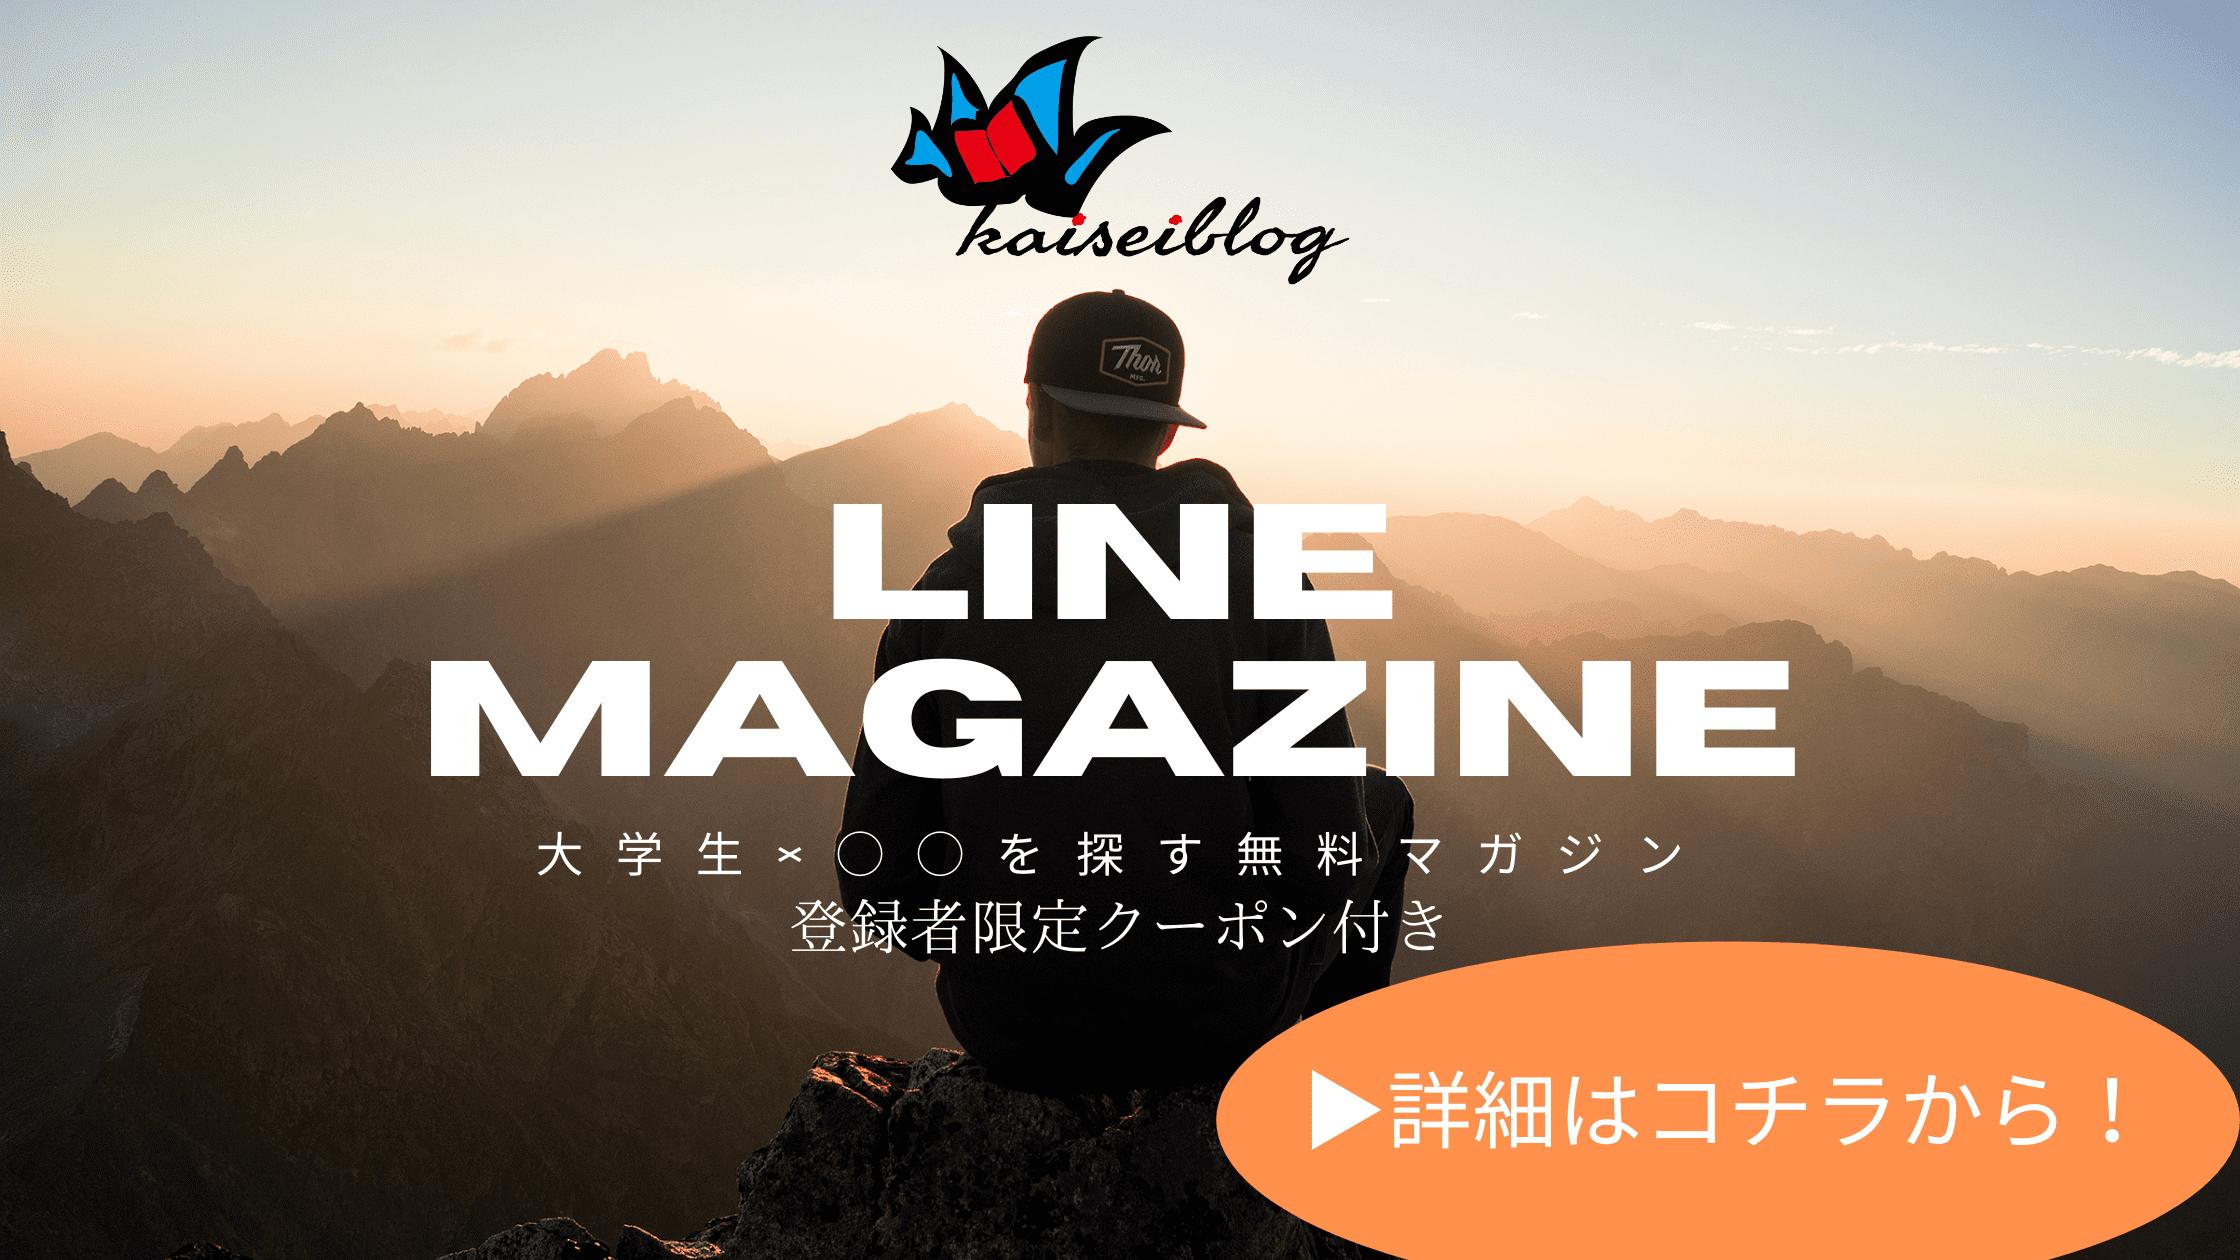 kaiseiblog LINEマガジン